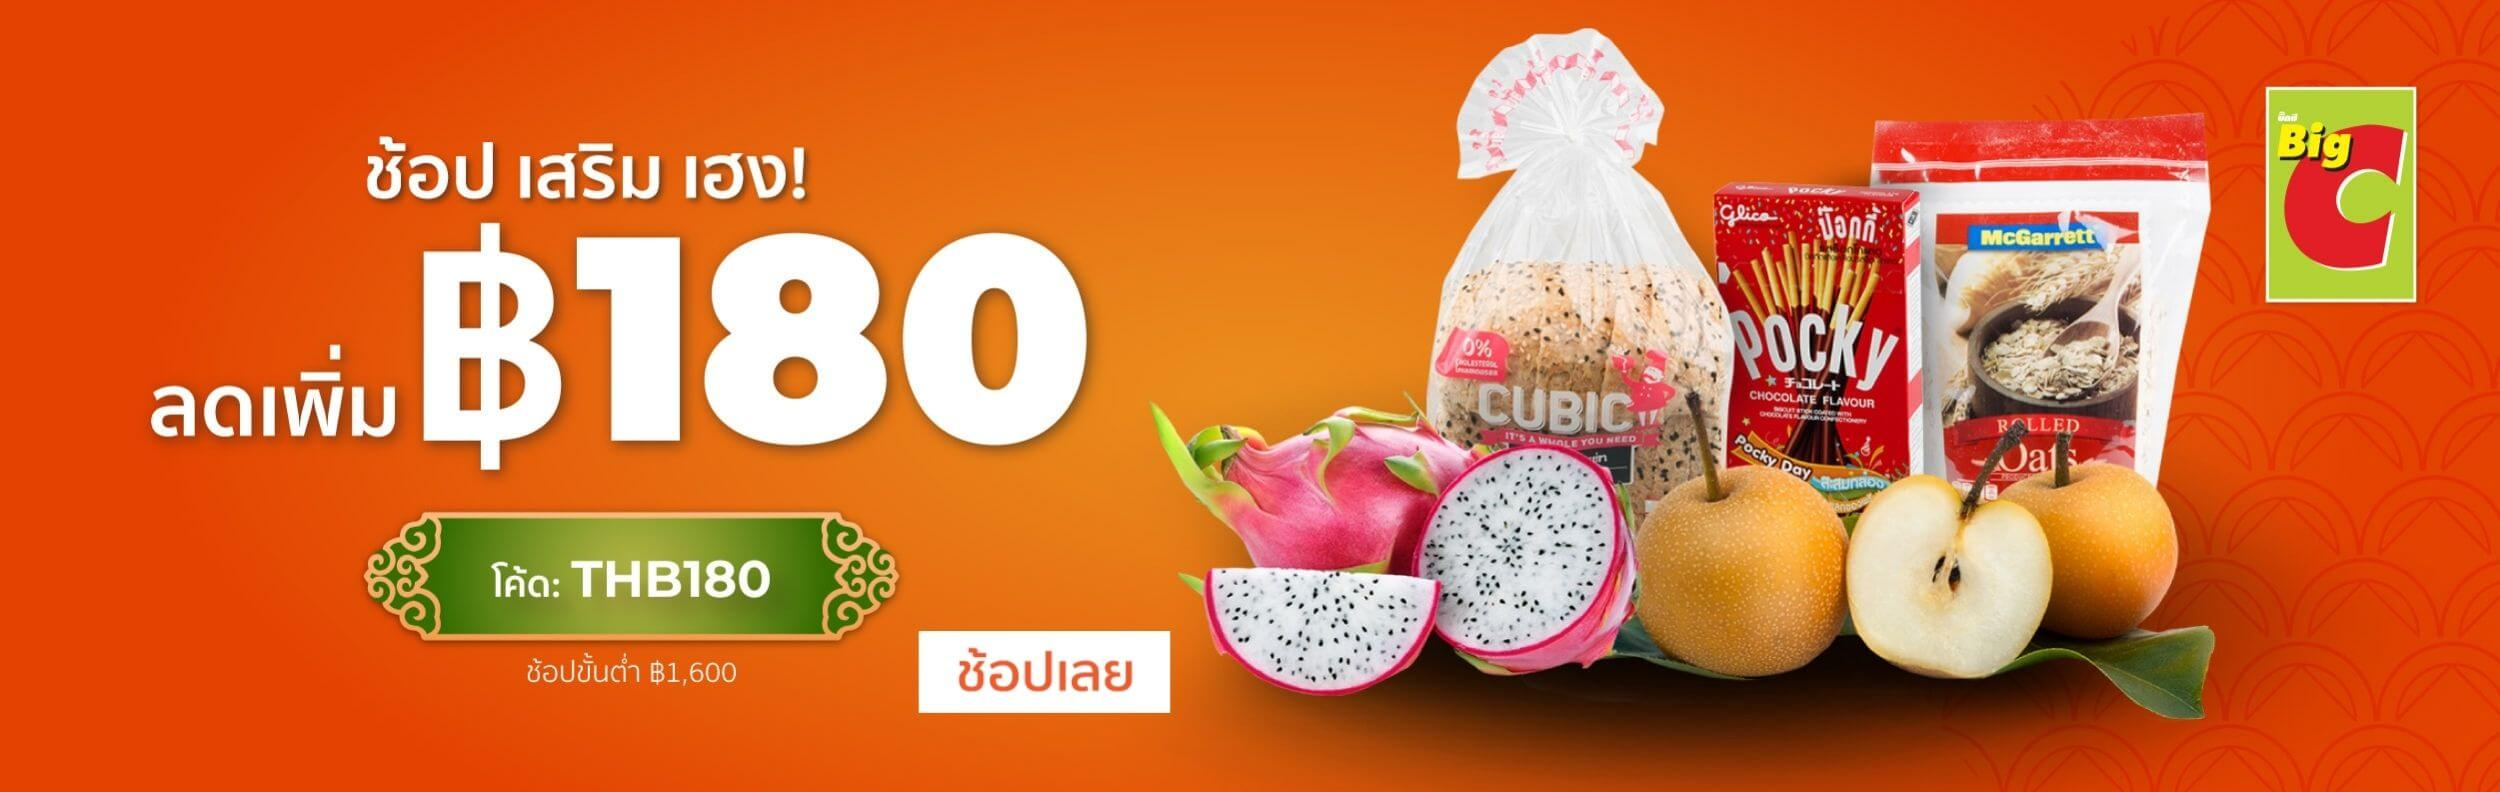 HappyFresh โปรโมชั่นวันตรุษจีน 2564 Big C ลดเพิ่ม180 บาท